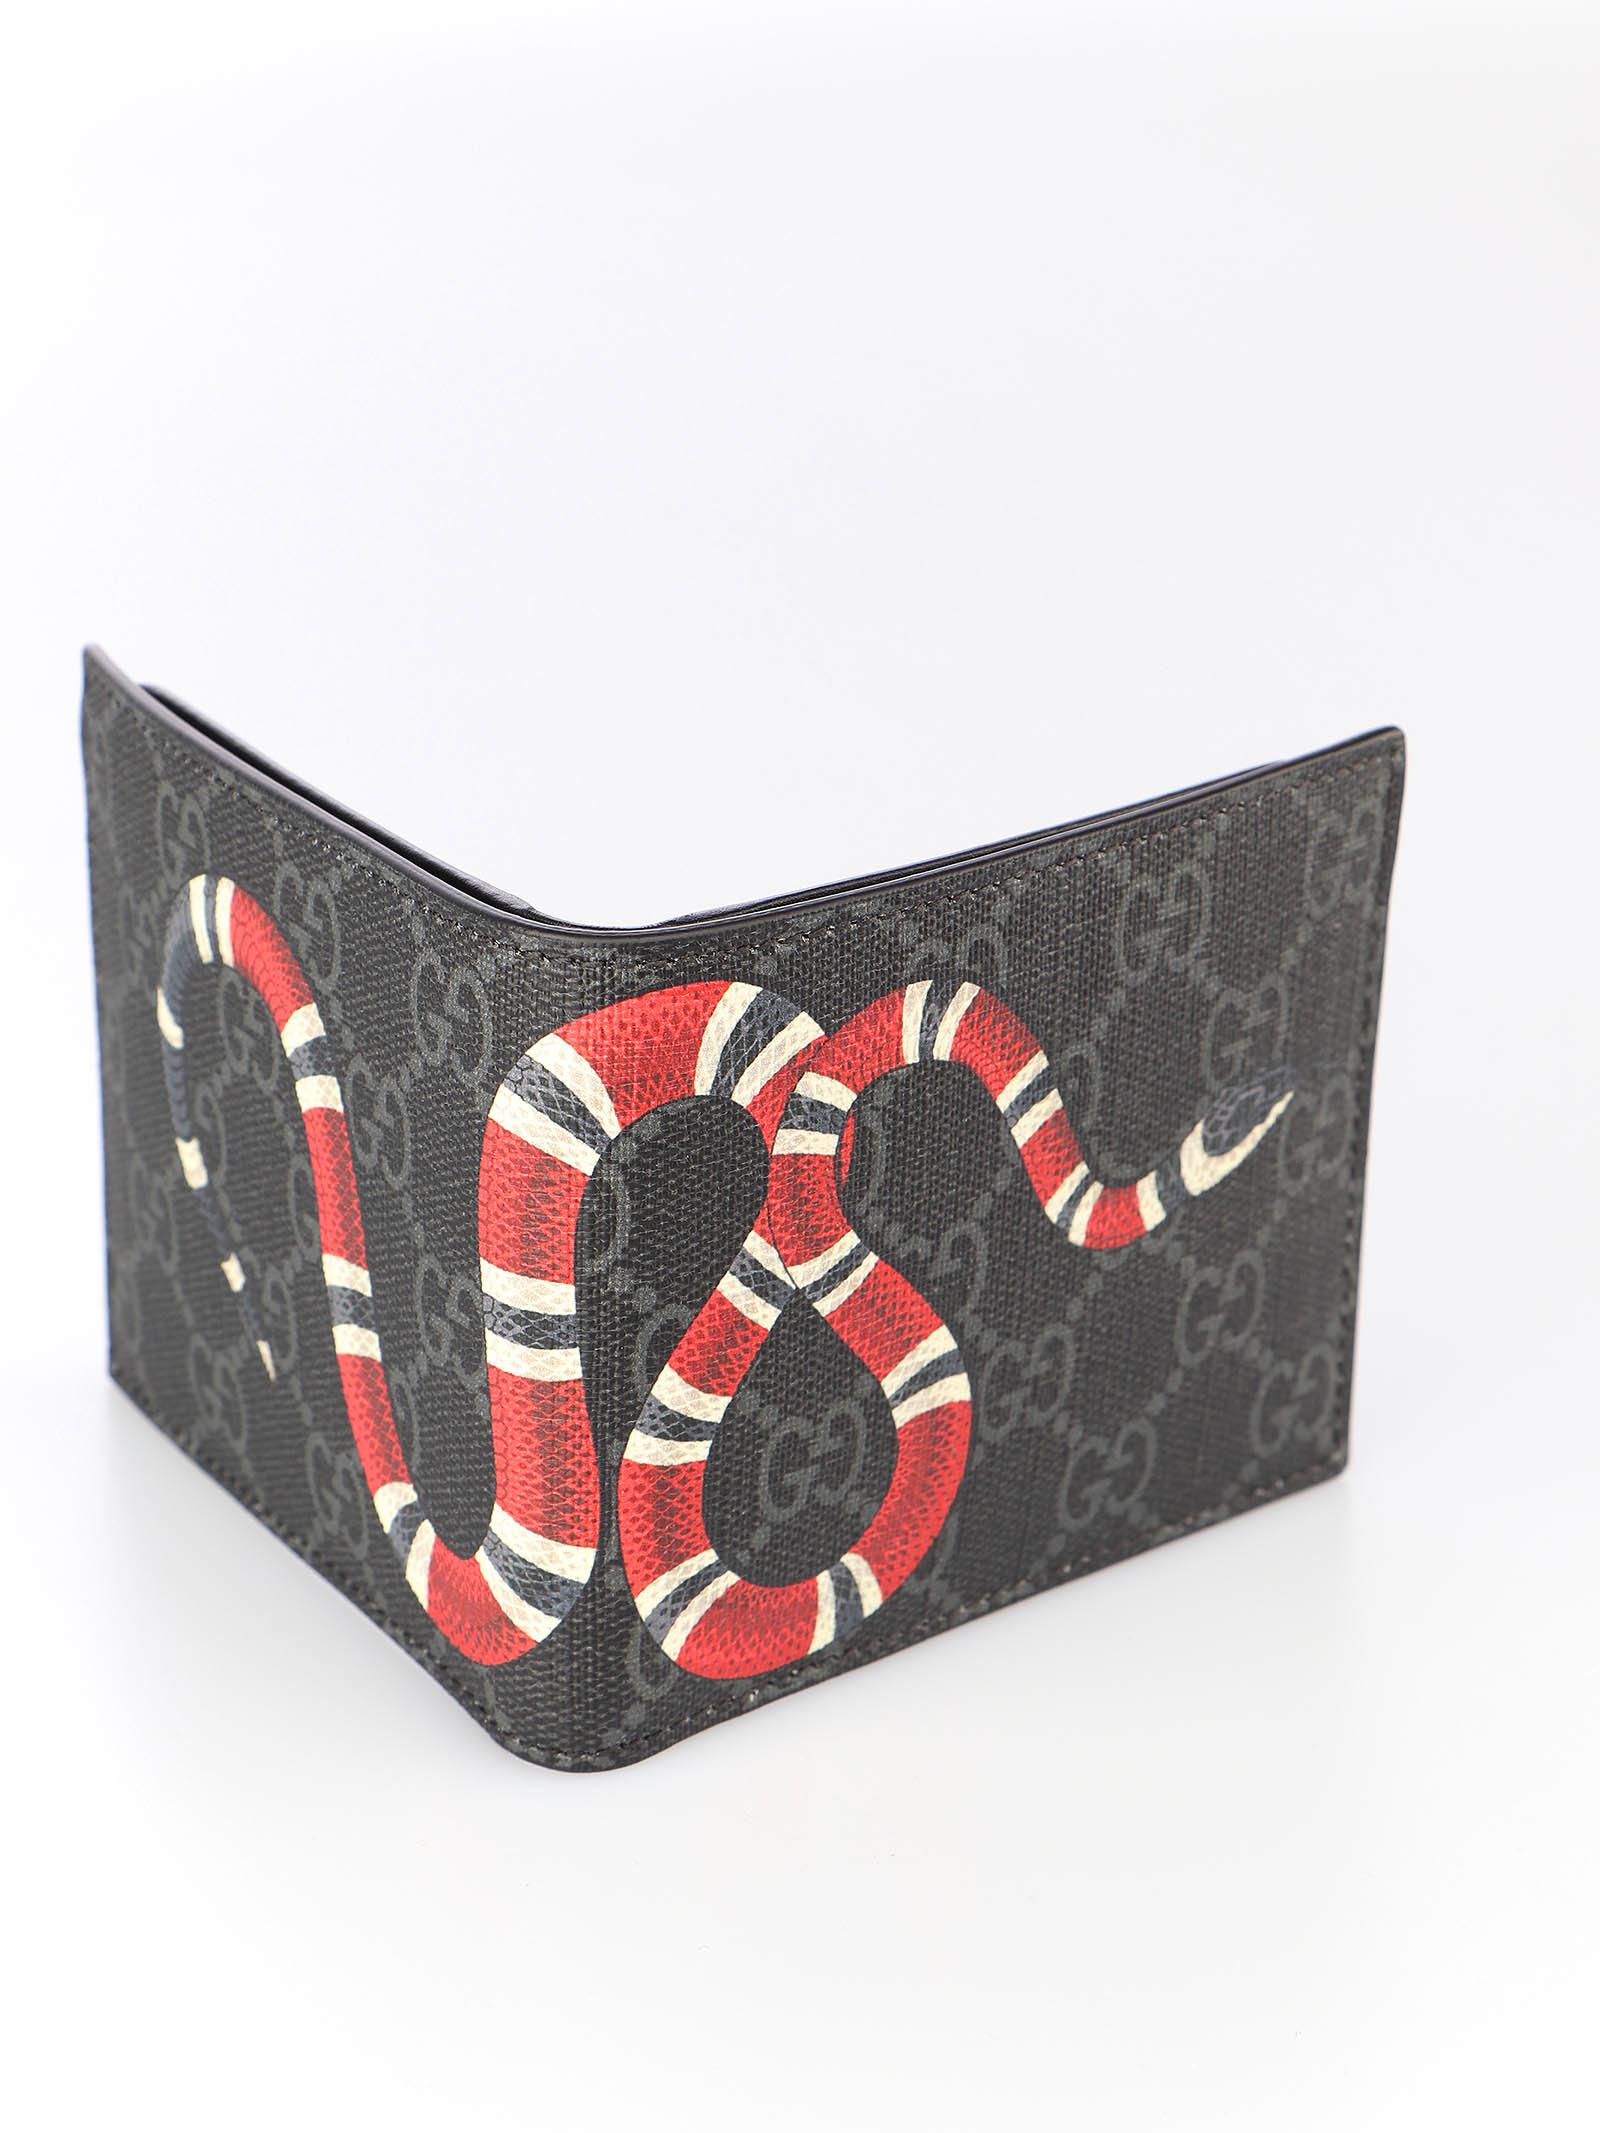 Immagine di Gucci | Kingsnake Print Gg Supreme Wallet